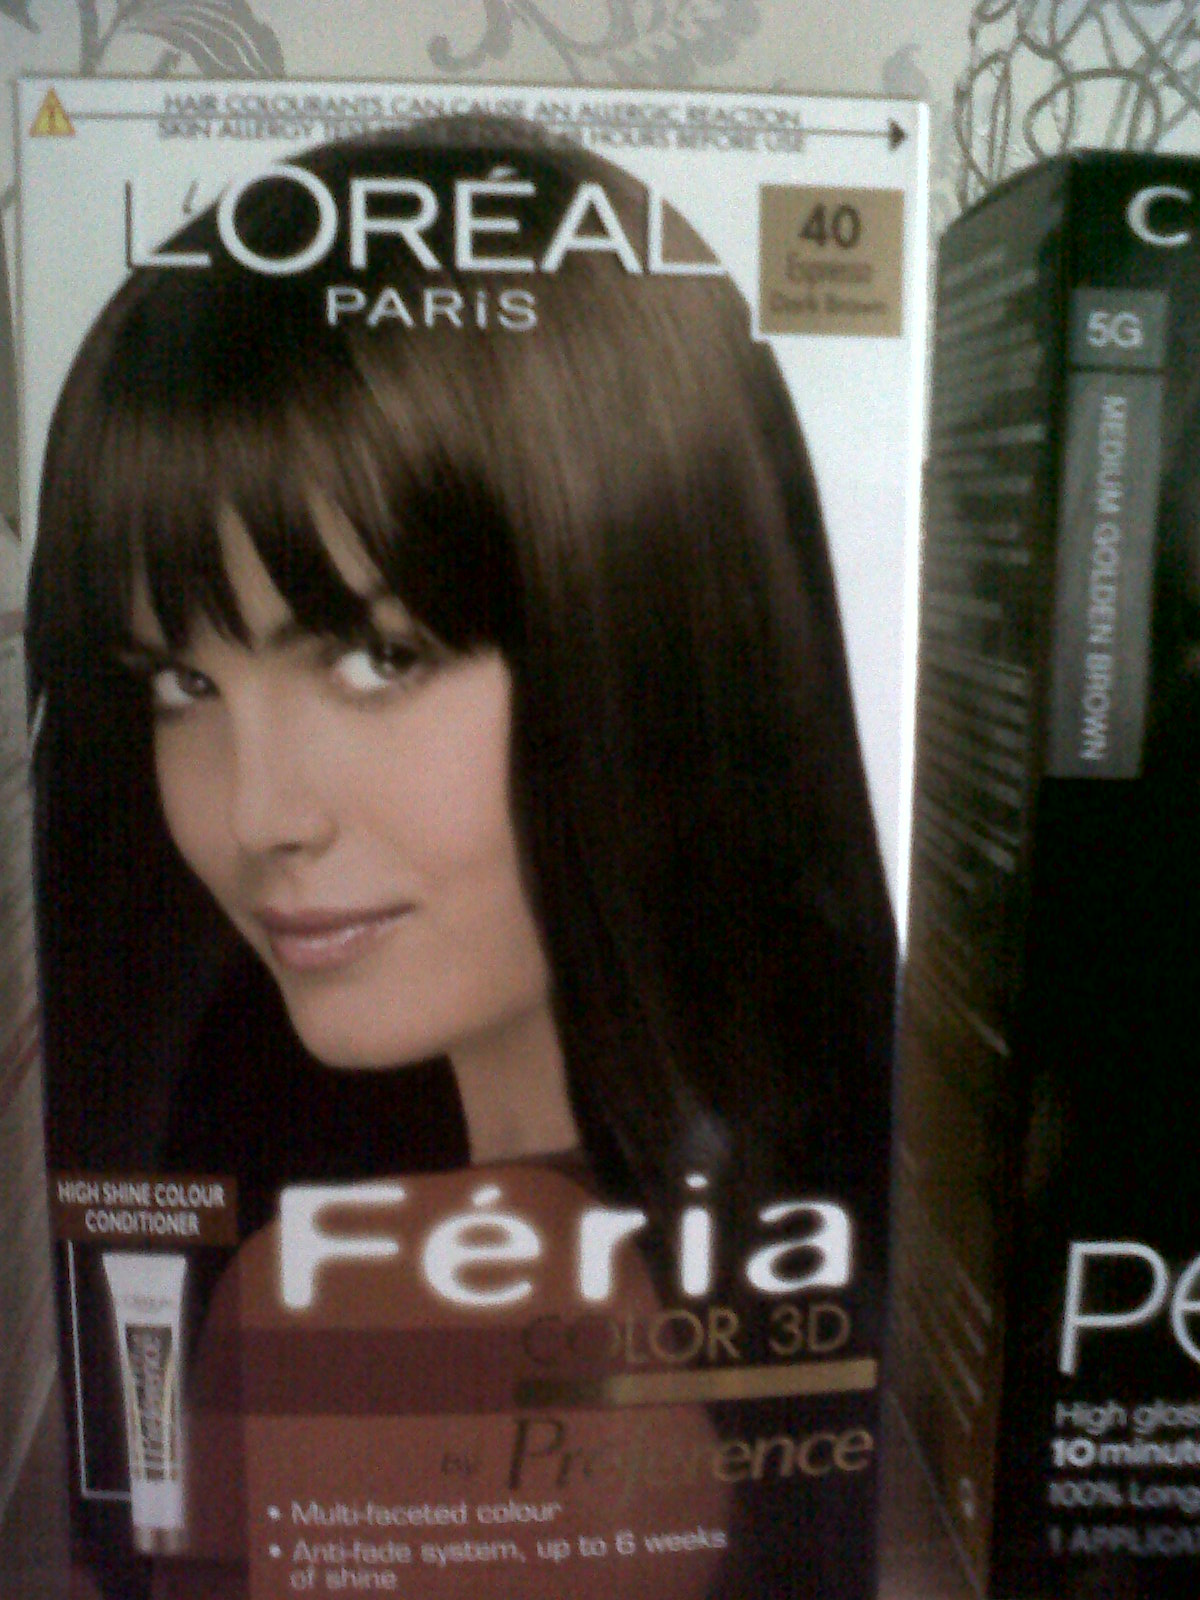 Loreal Hair Color Asda